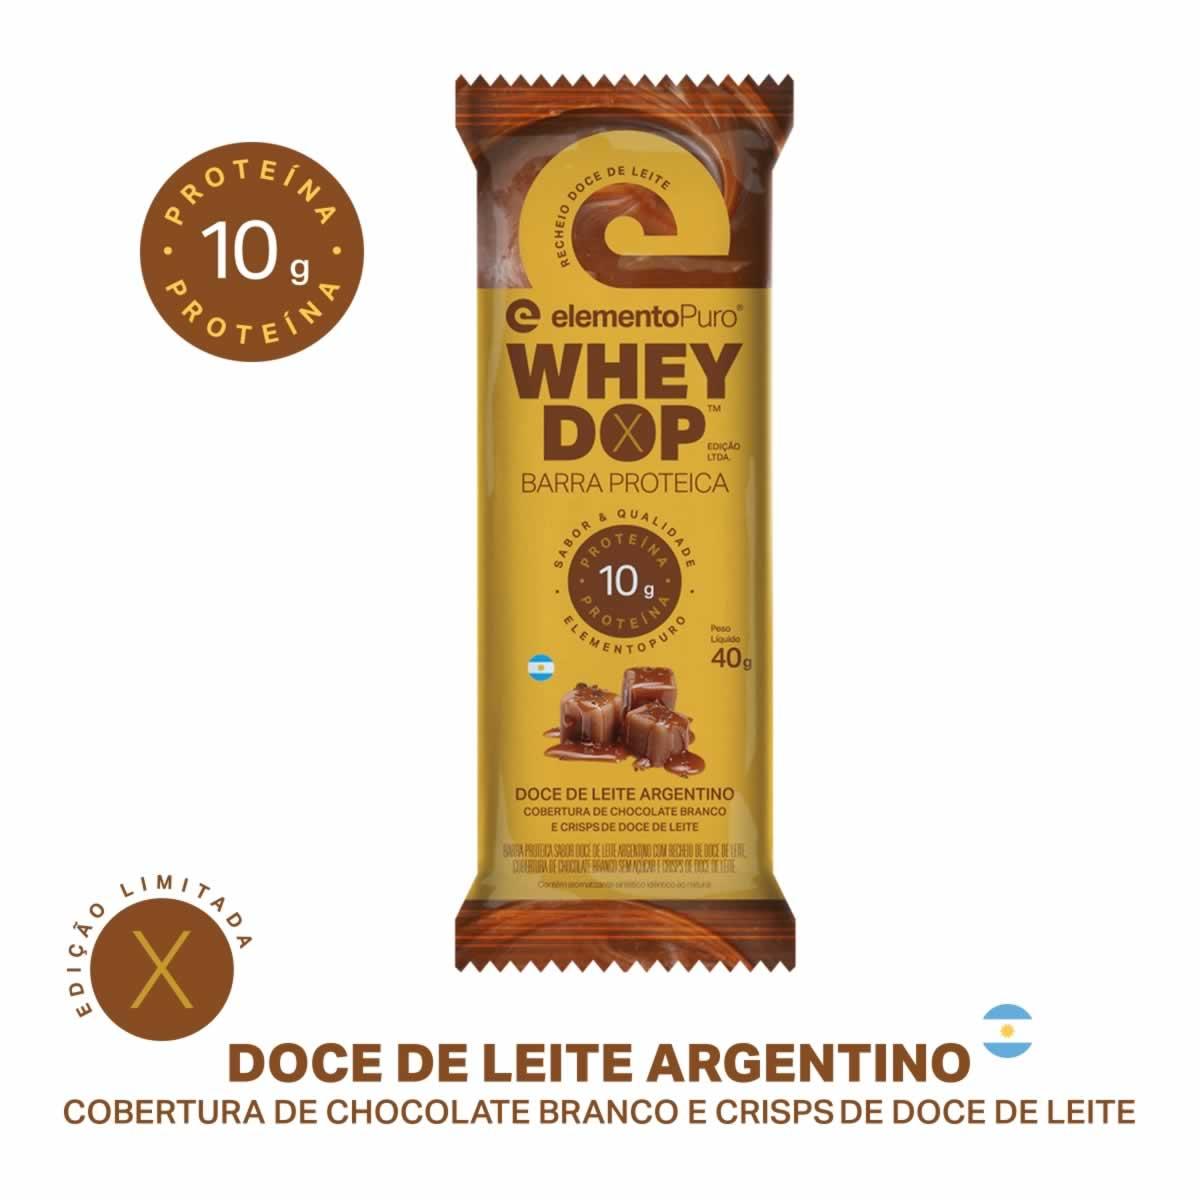 Wheydop Bar X 40g Doce de Leite Argentino Elemento Puro